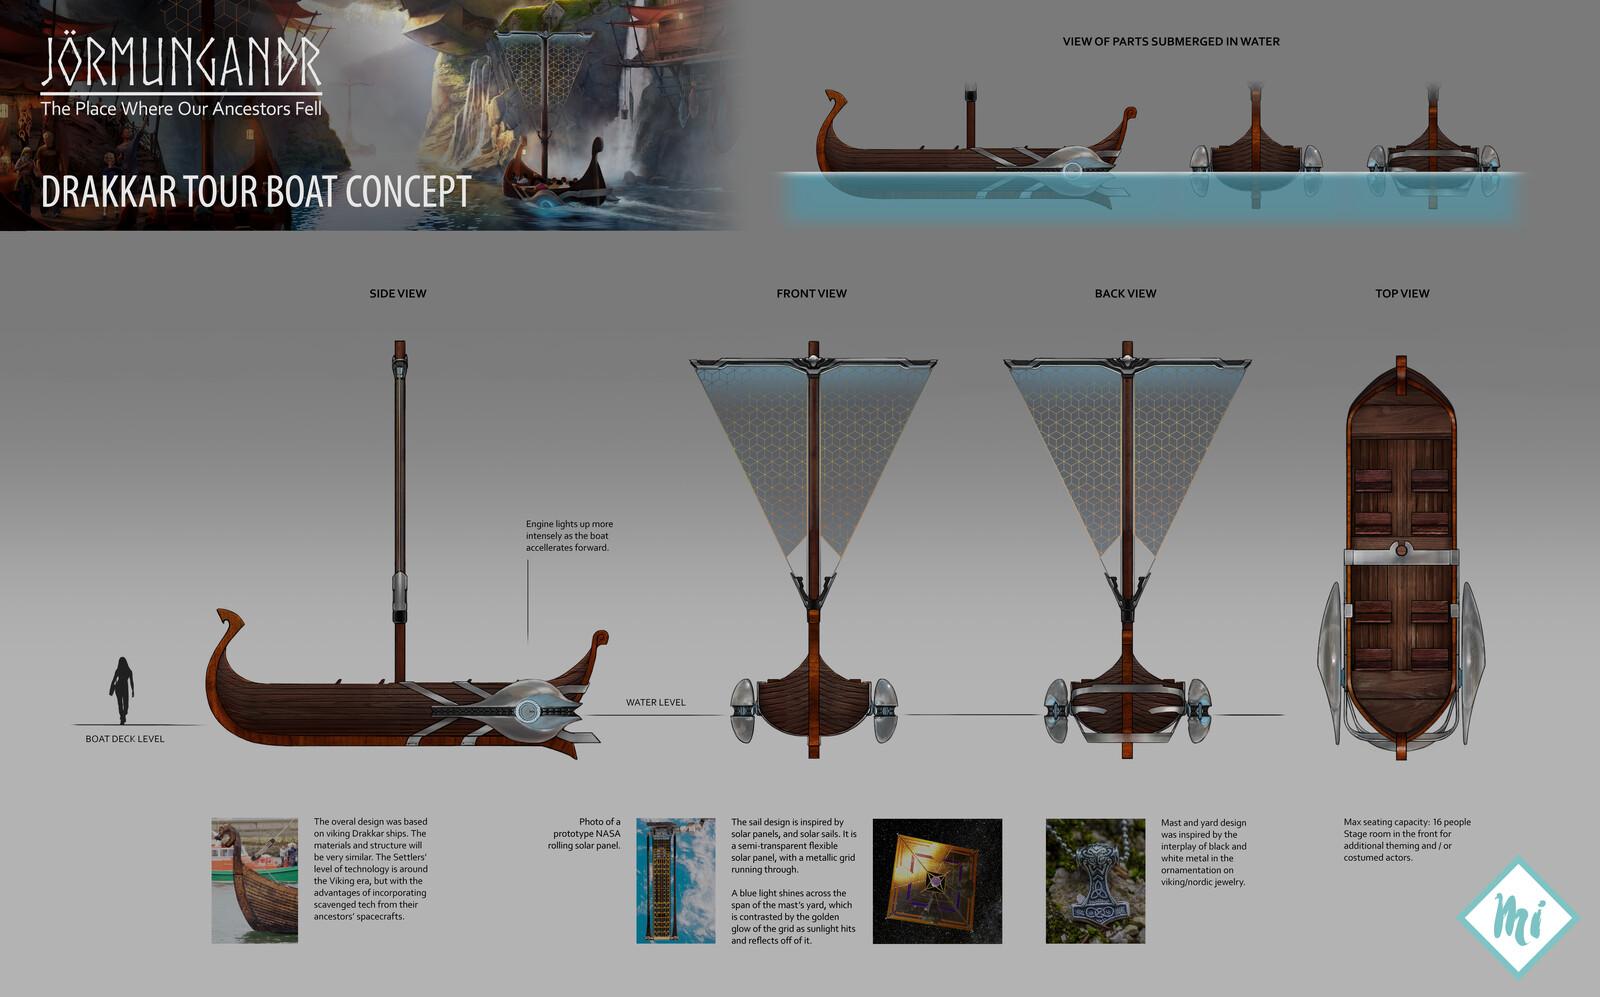 Jörmungandr Project: Drakkar Tour Boat Design